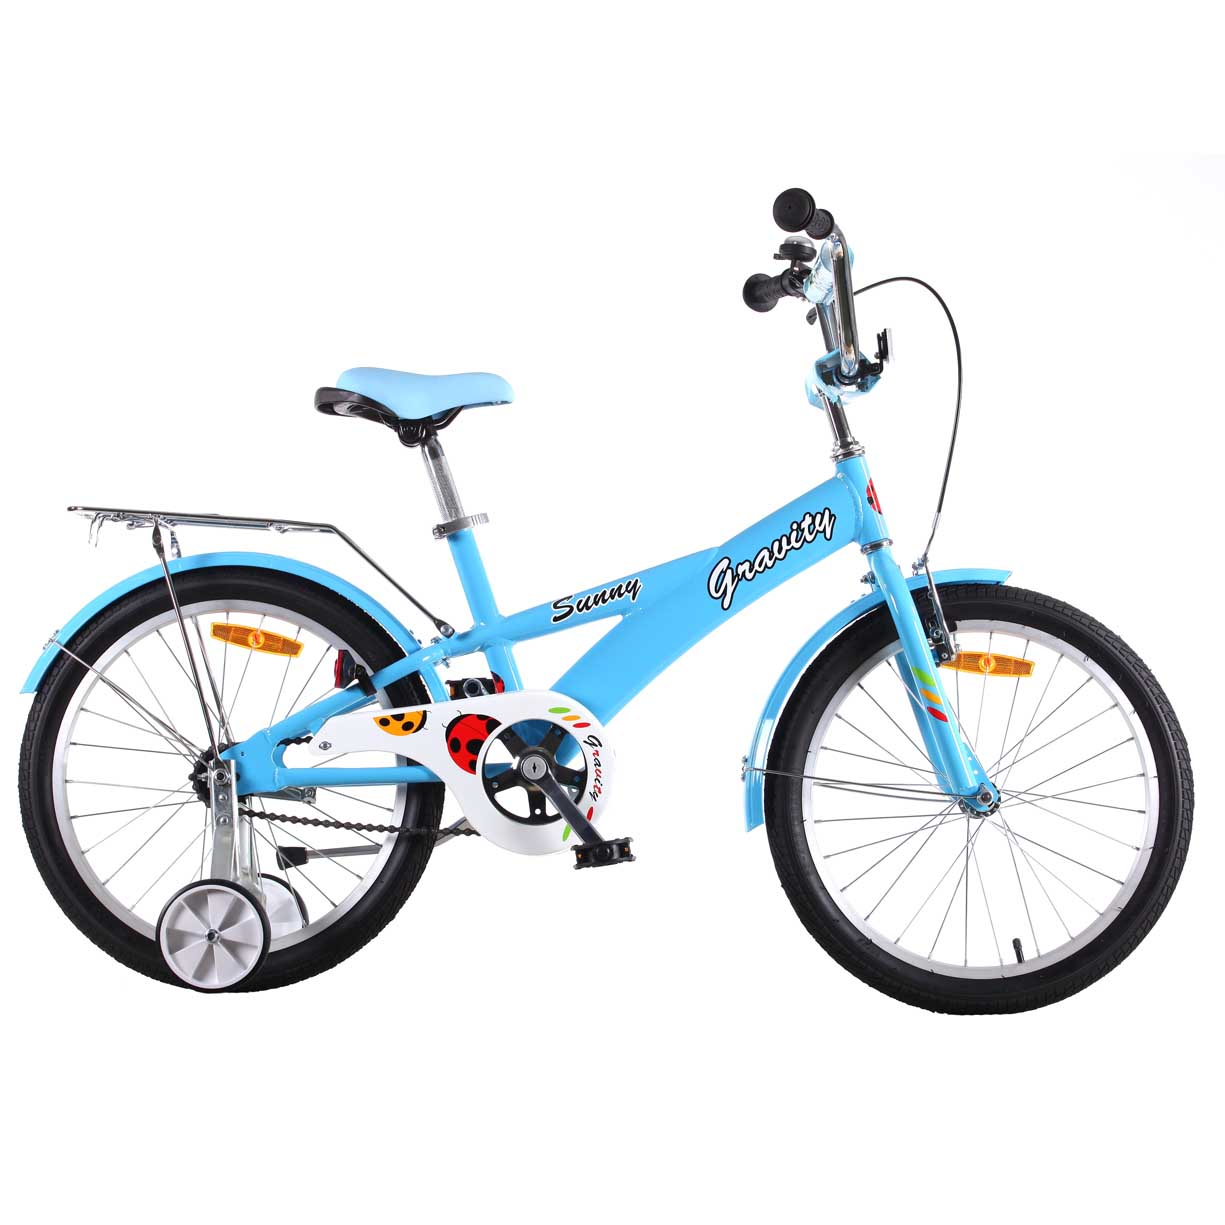 "Велосипед Gravity 20"" SUNNY голубой 1 скор. алюм.рама руч.торм. (7219-2) УЦЕНКА!!! 270917"